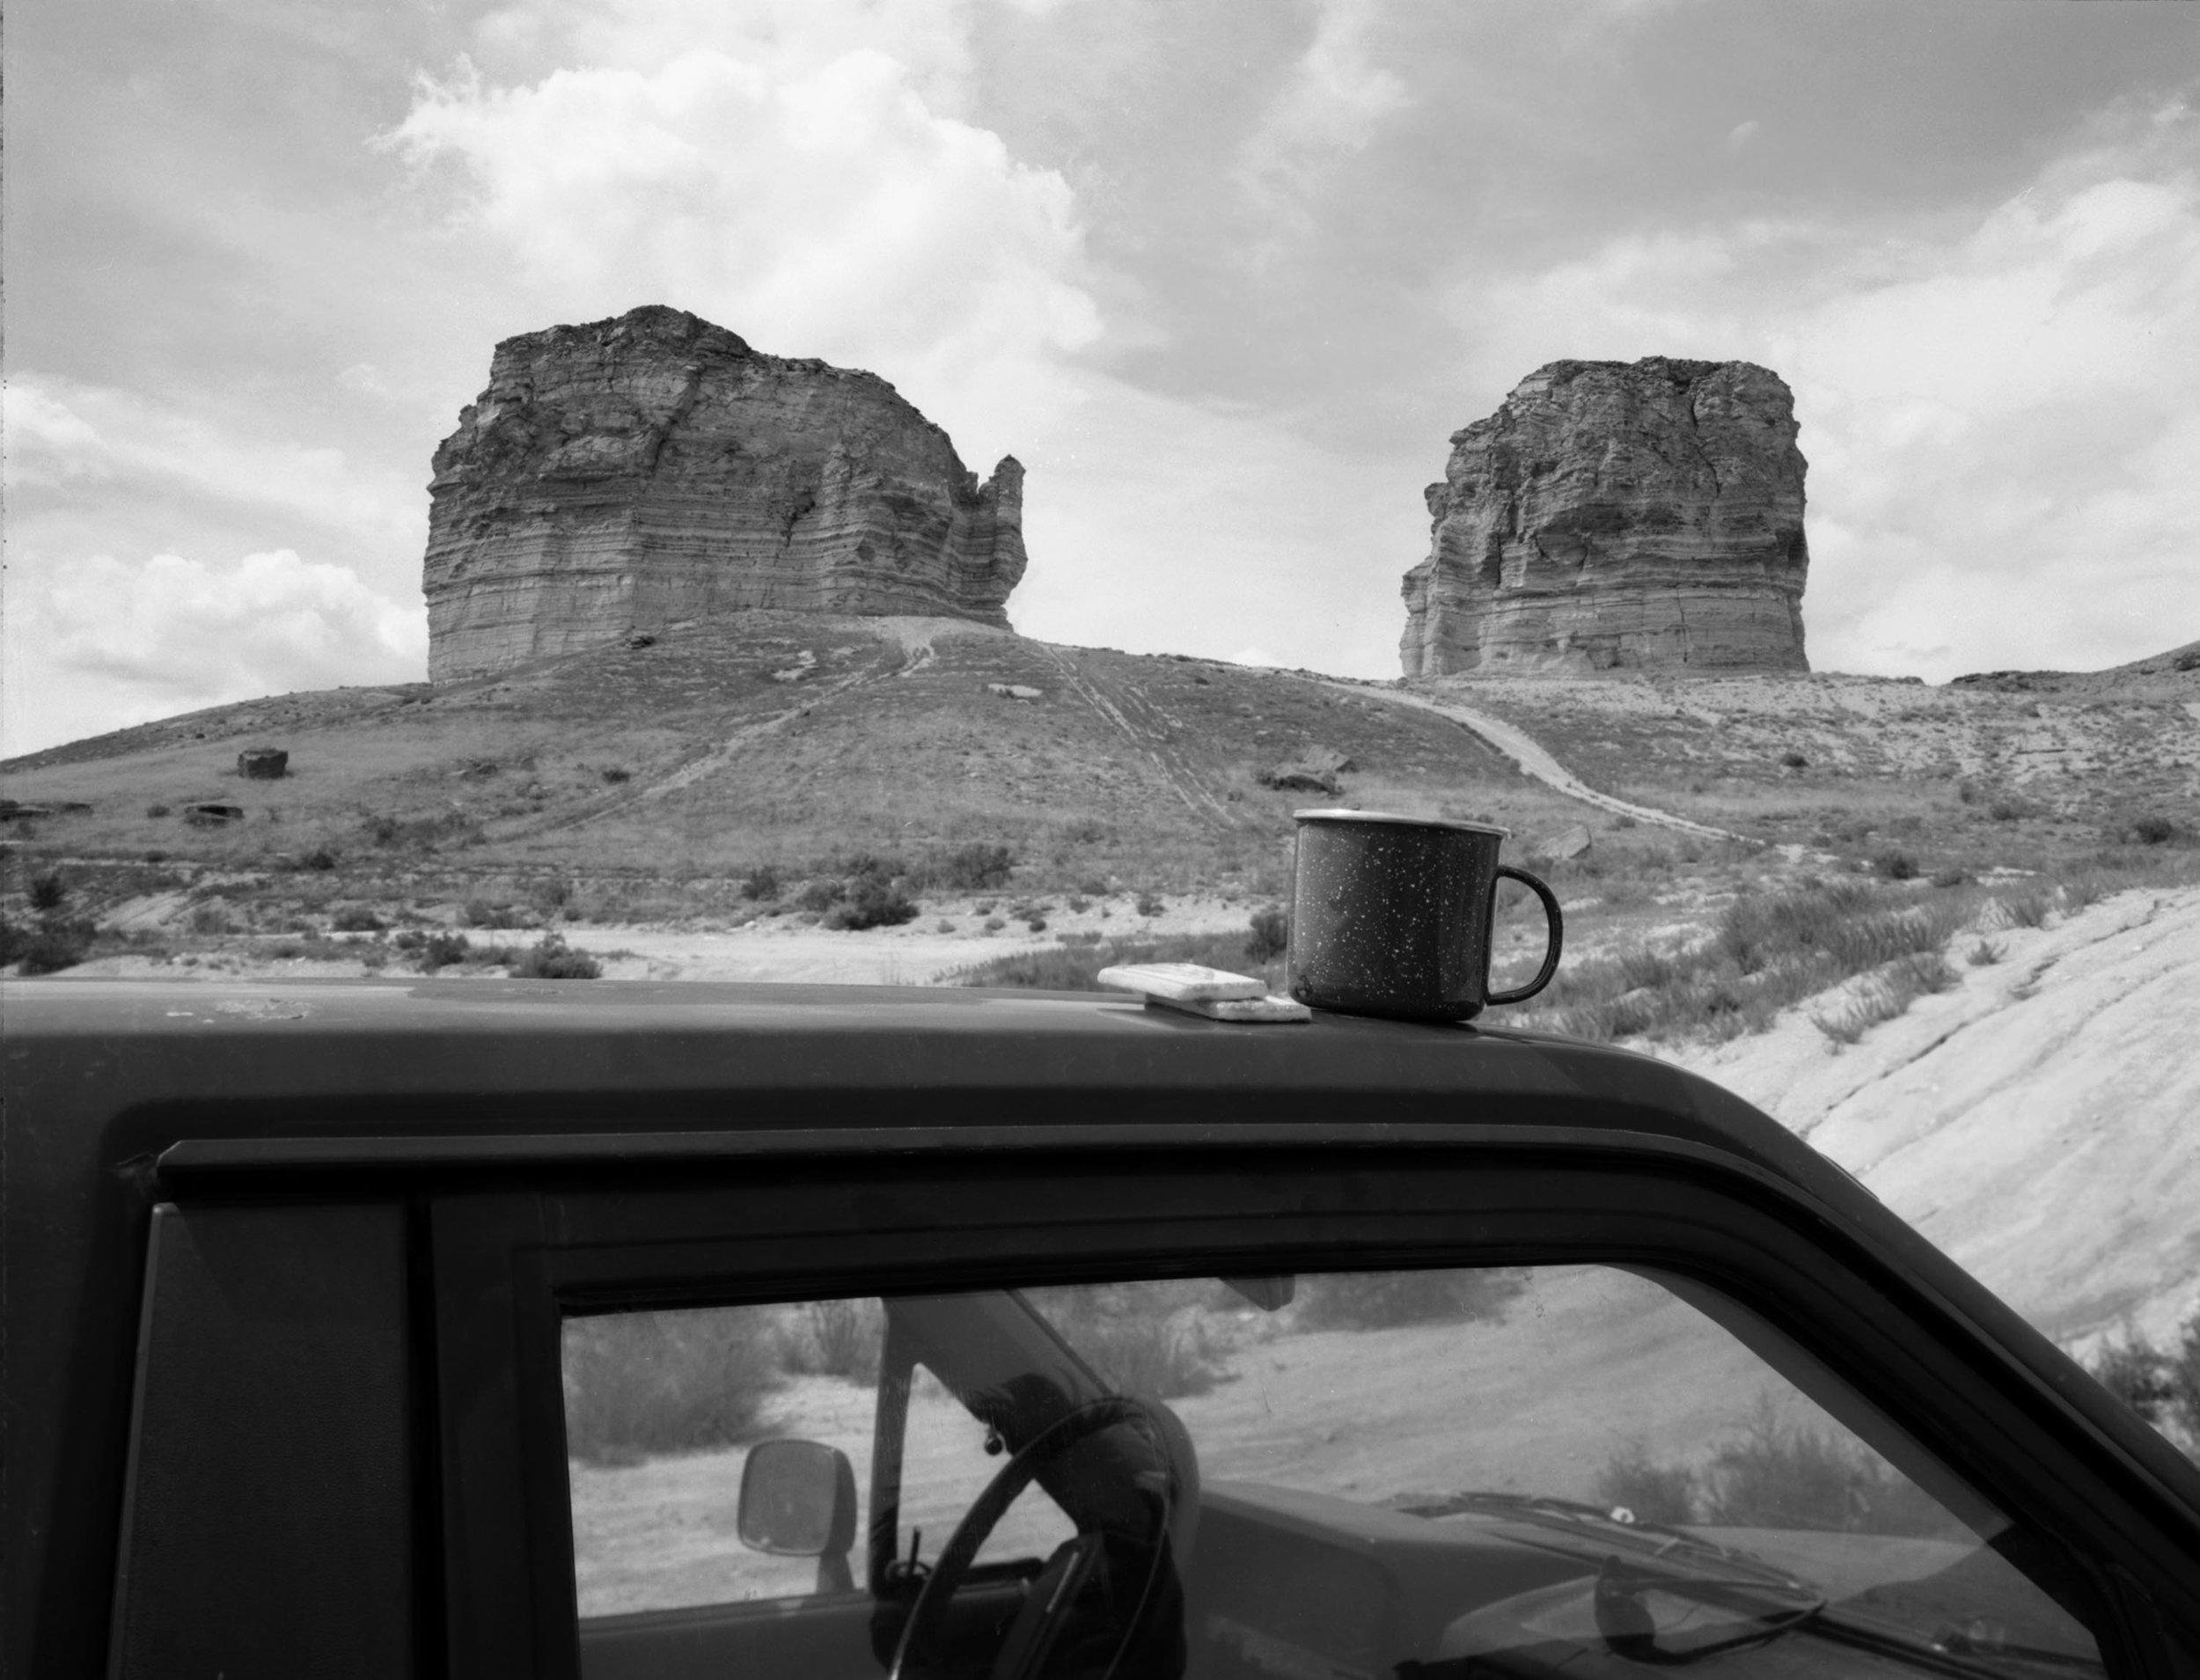 Mark Klett, Tea Break at Teapot Rock, 1997 © Mark Klett, courtesy the artist/Pace MacGill Gallery, NY